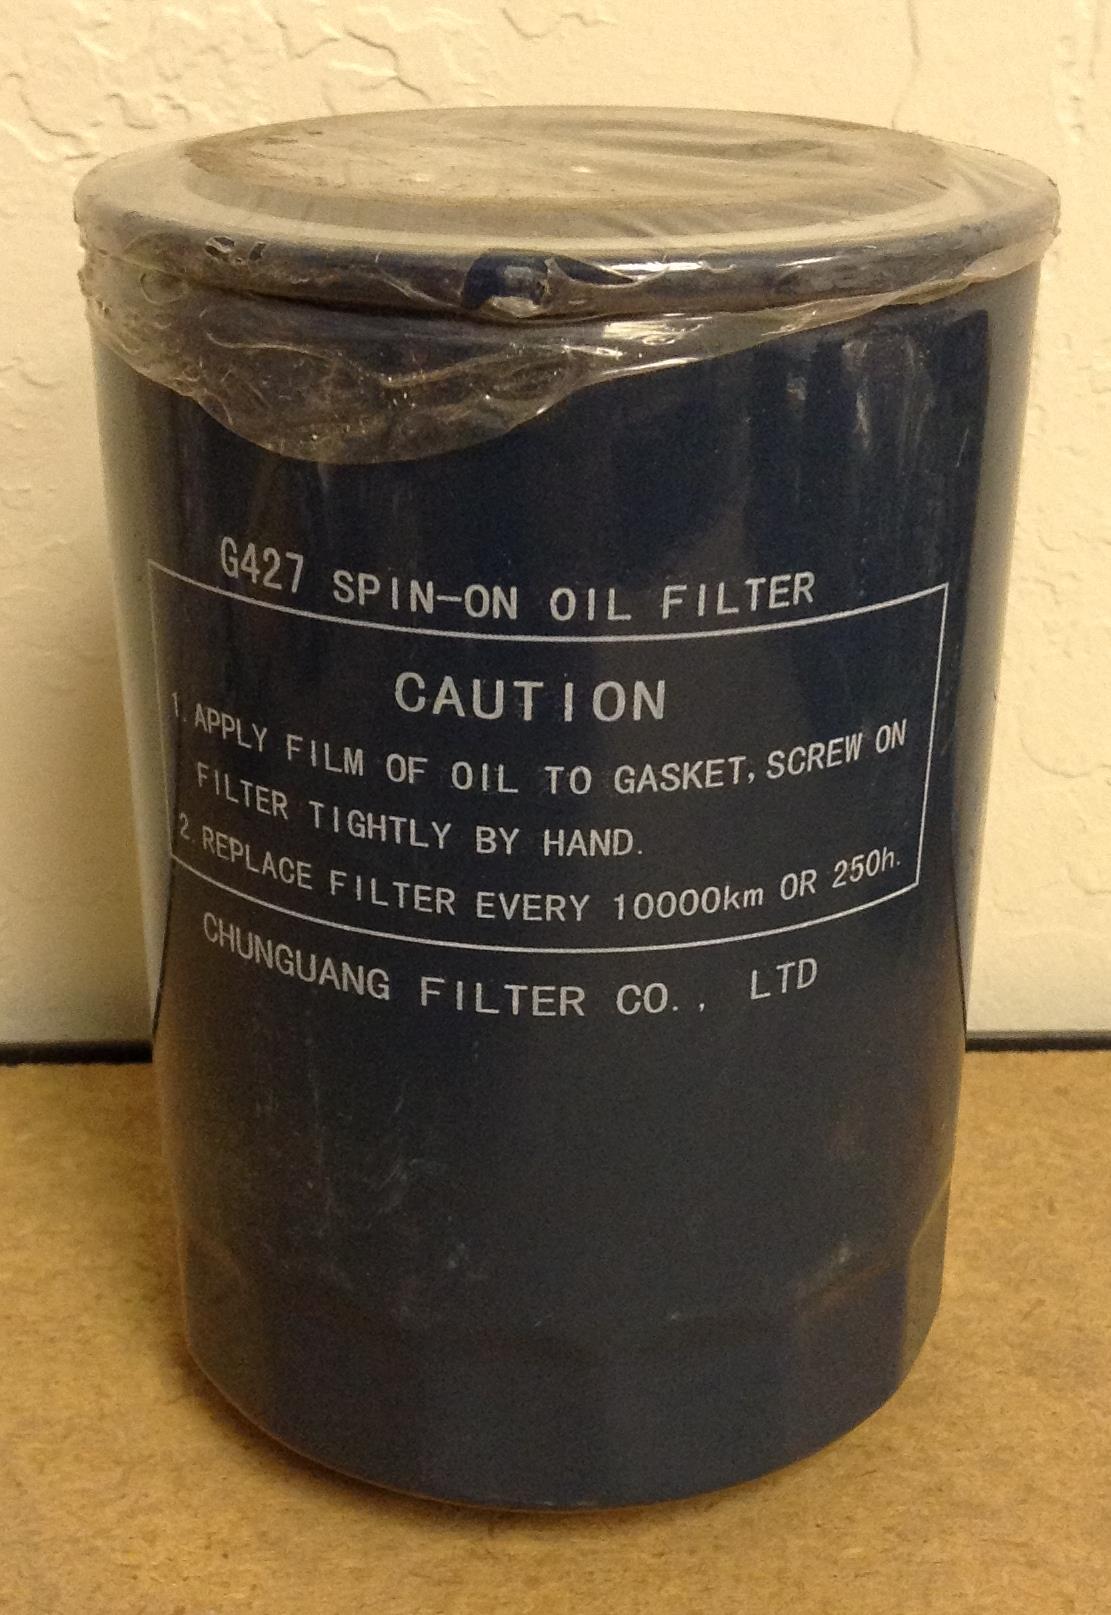 Jx0810 screw on oil filter for yangdong diesel engine for Diesel motor oil in gas engine